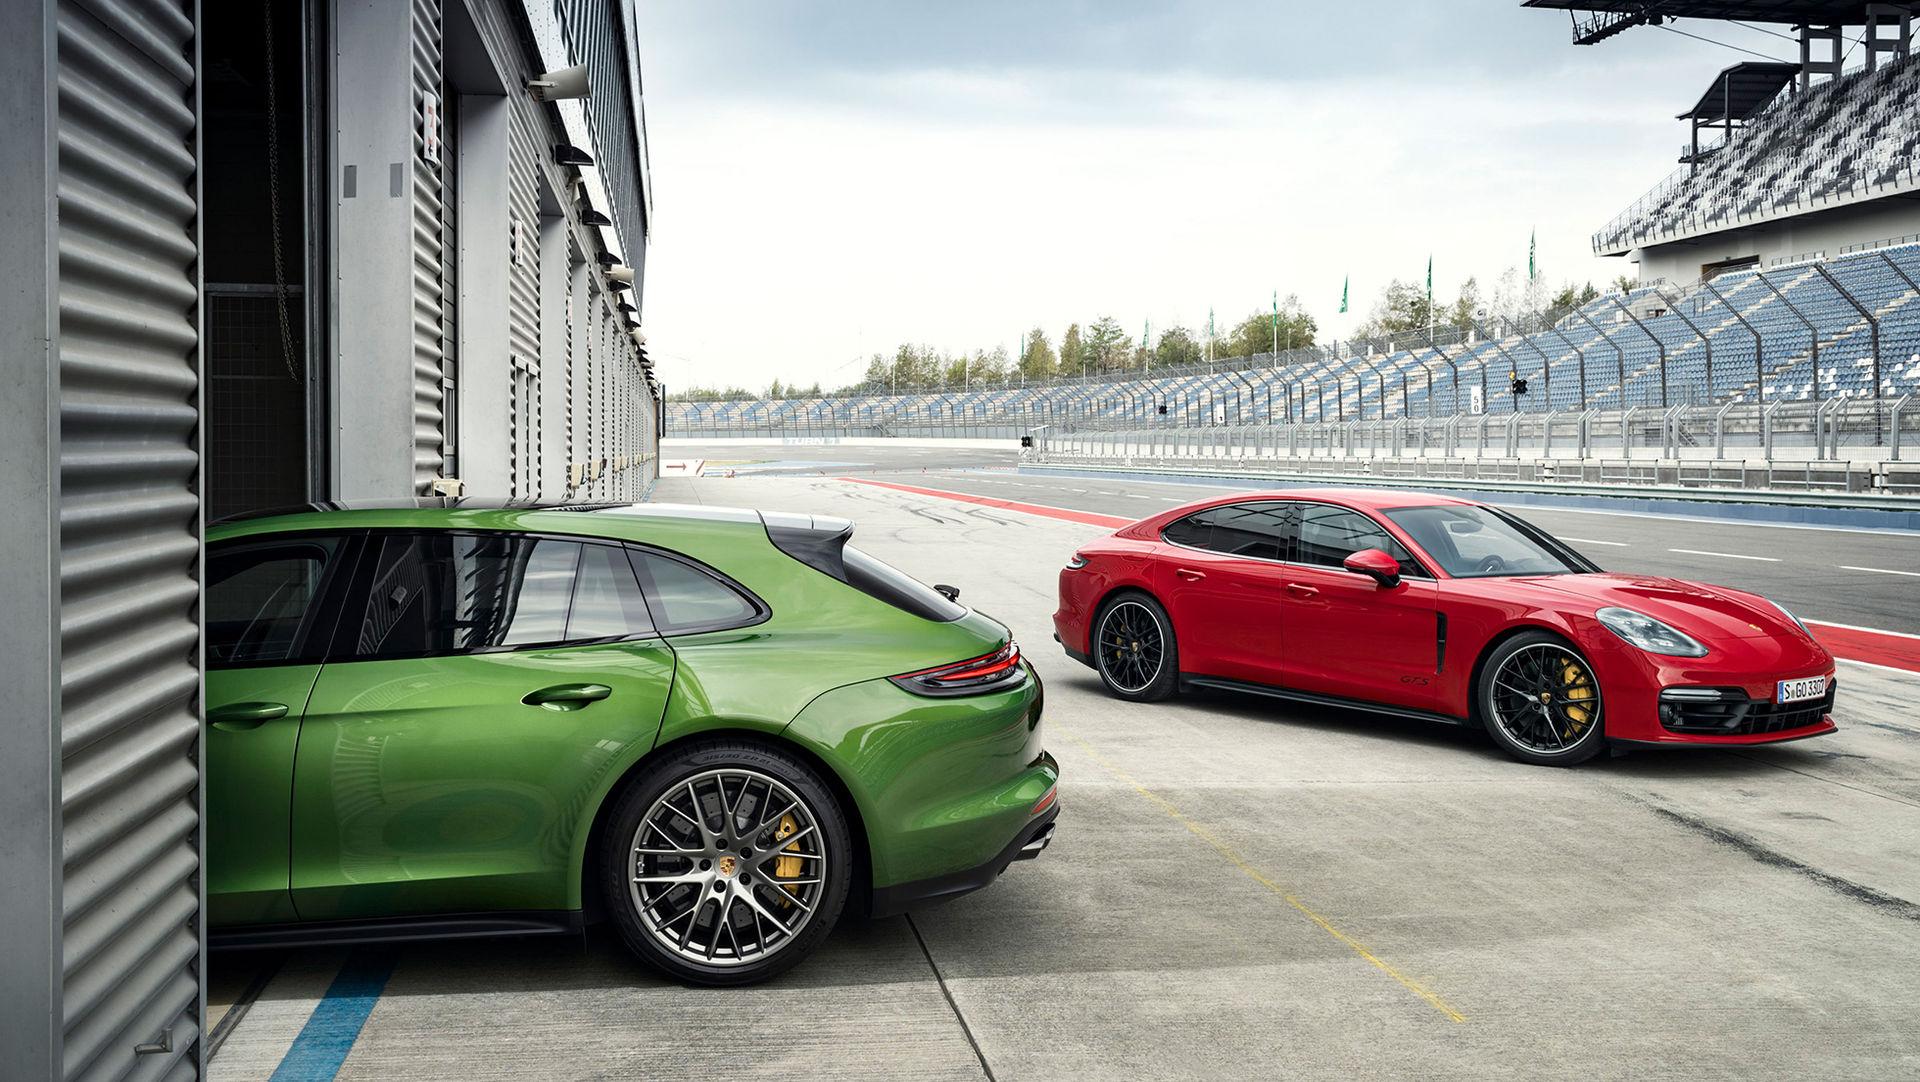 Porsche rullar ut nya Panamera GTS